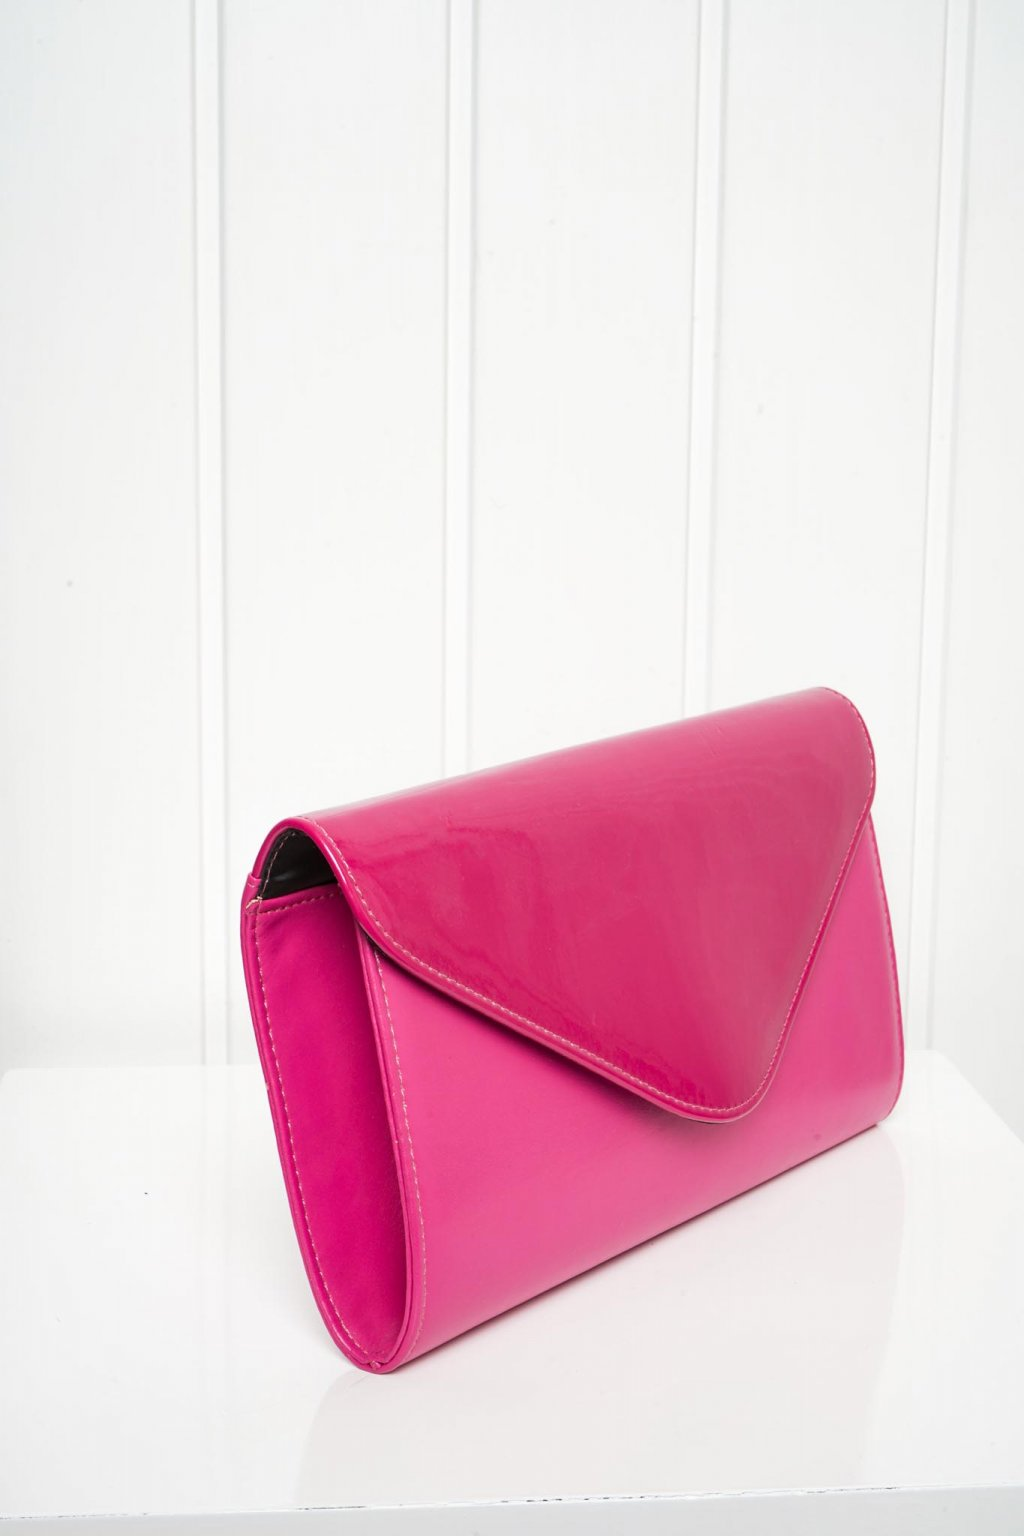 Kabelka, crossbody, ruksak, shopping bag, shopperka, 613